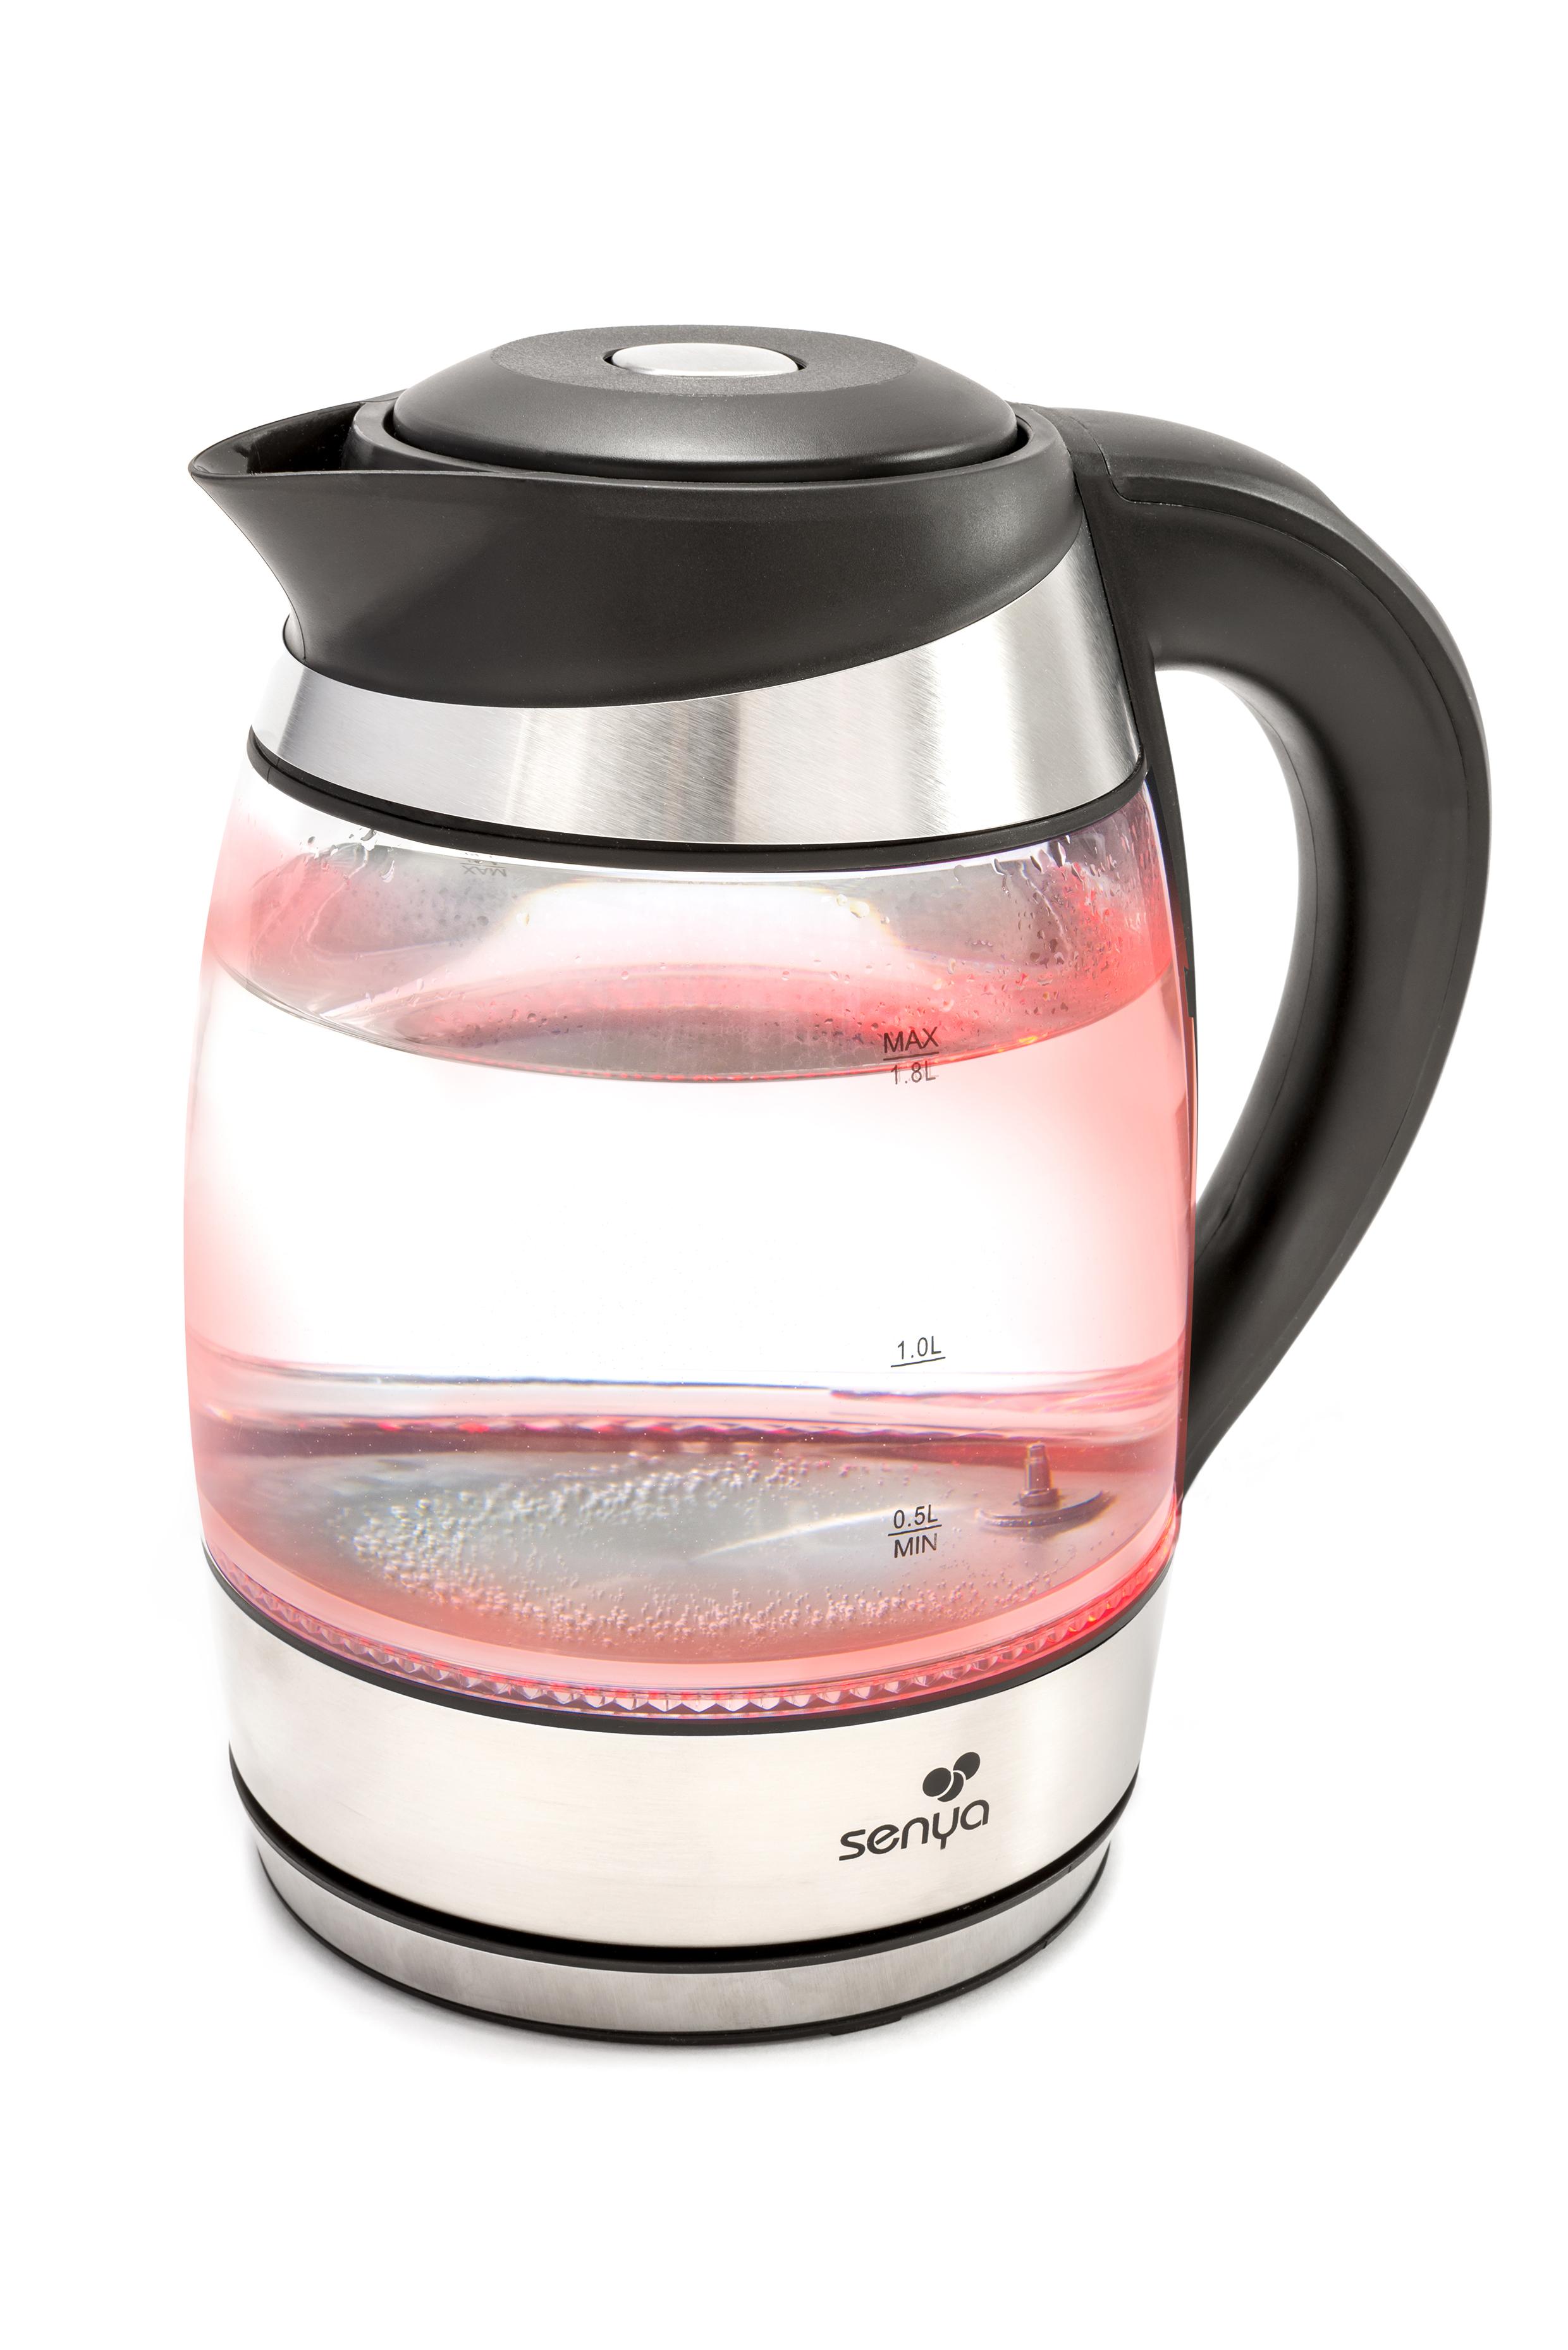 bouilloire en verre temp rature r glable tea colors senya. Black Bedroom Furniture Sets. Home Design Ideas